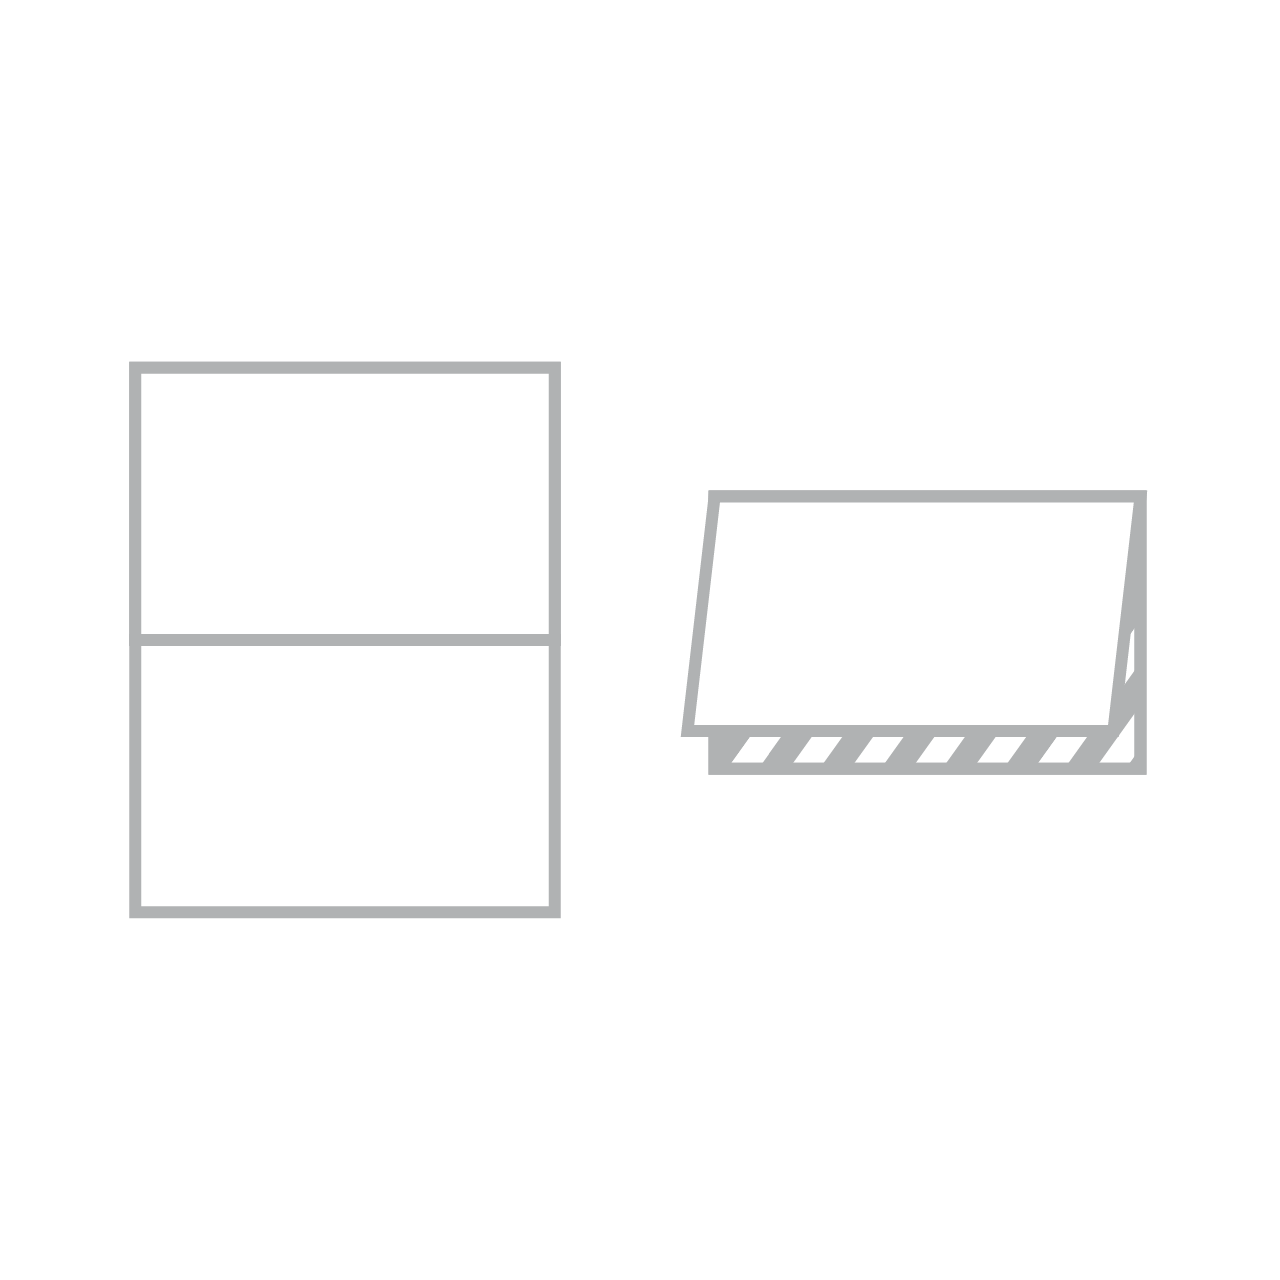 Illustrationen_Karten_Klappkarte_A6_QF_KF